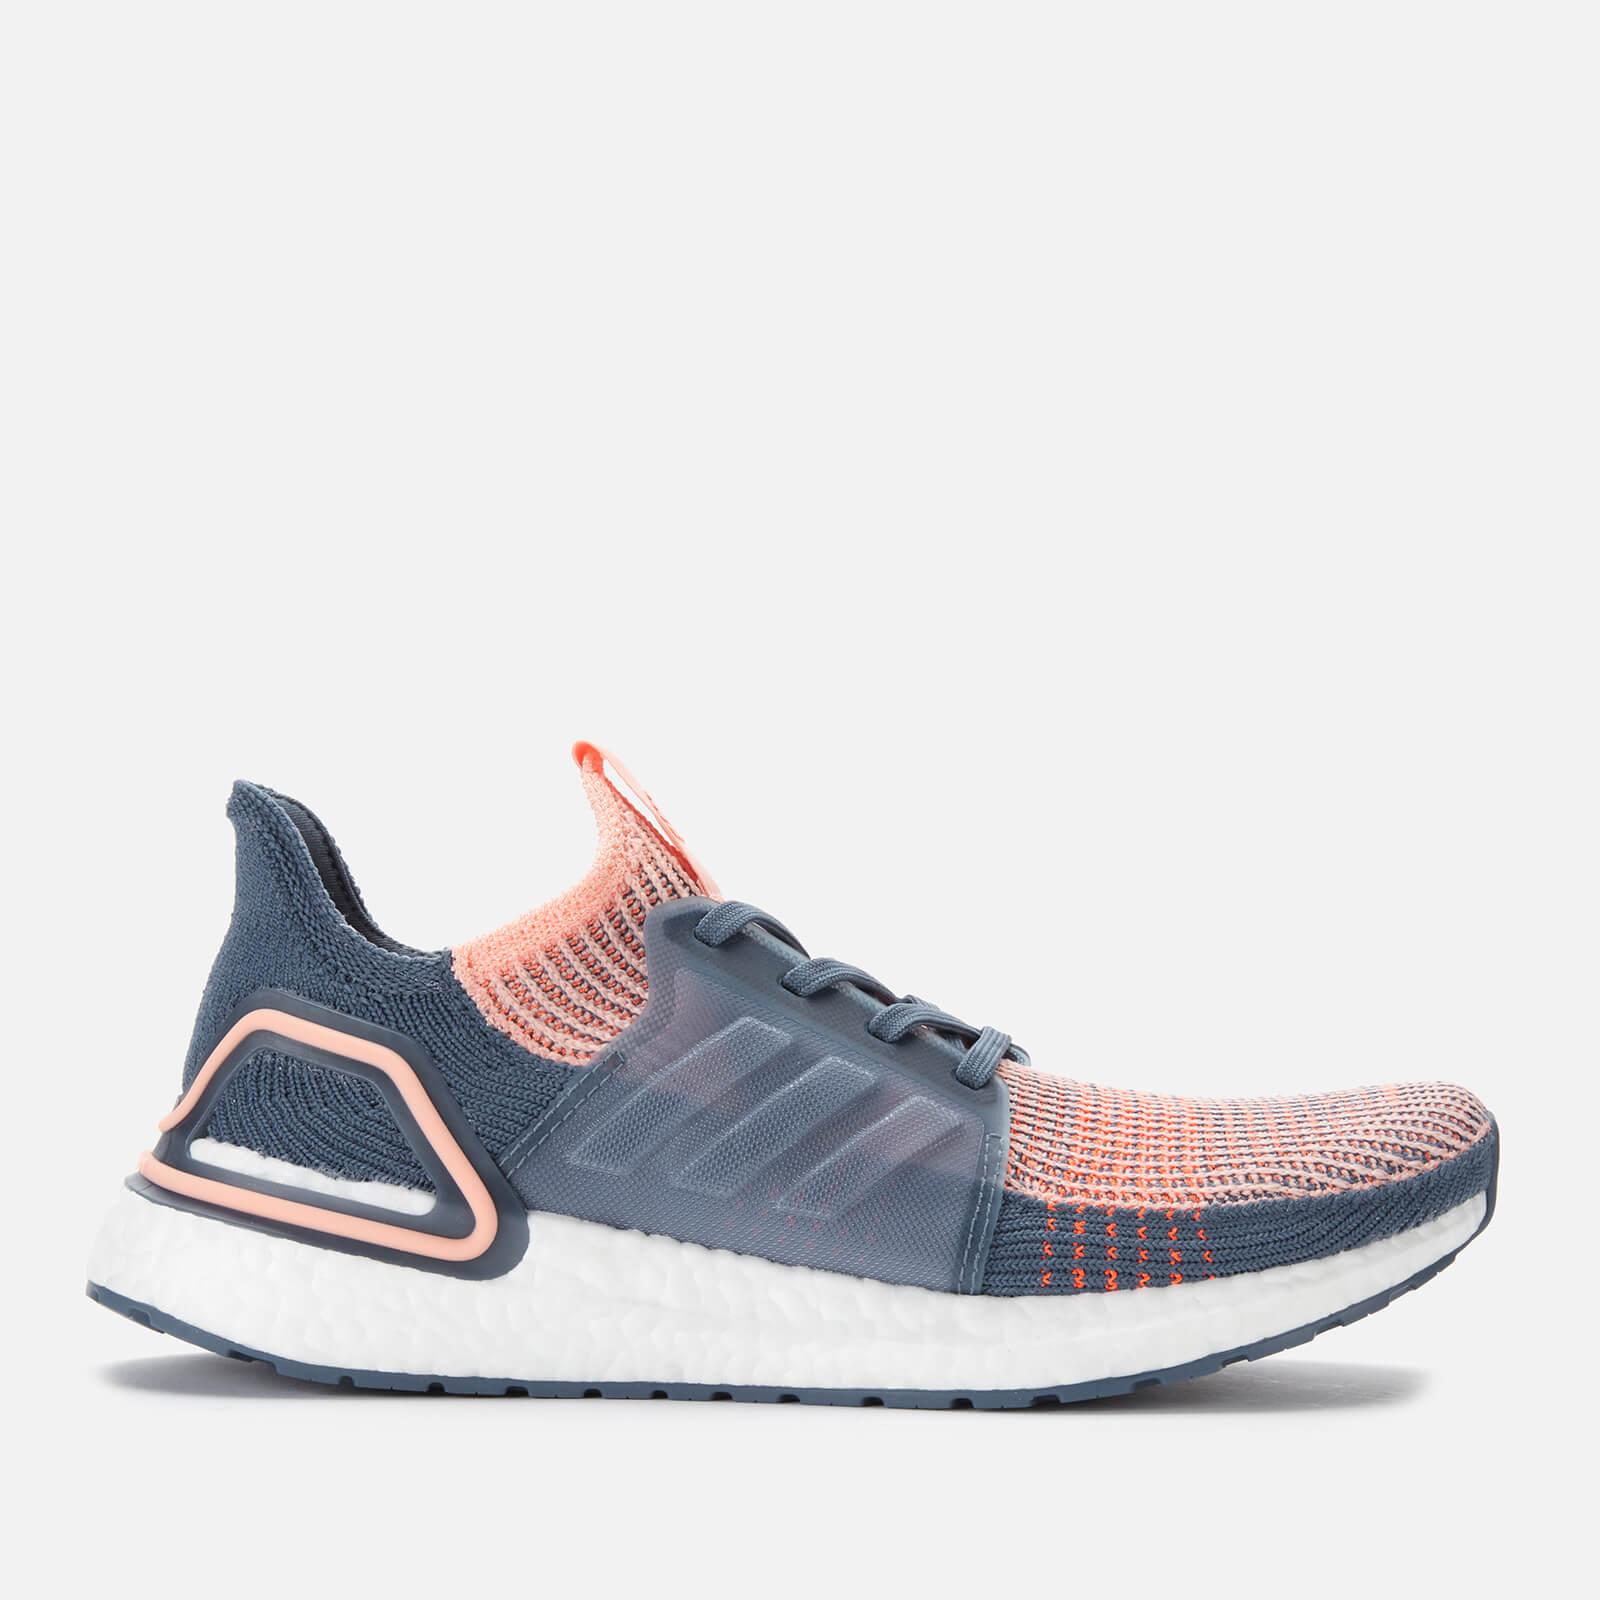 adidas Women's Ultraboost 19 Trainers - Pink/Blue - UK 4 - Multi